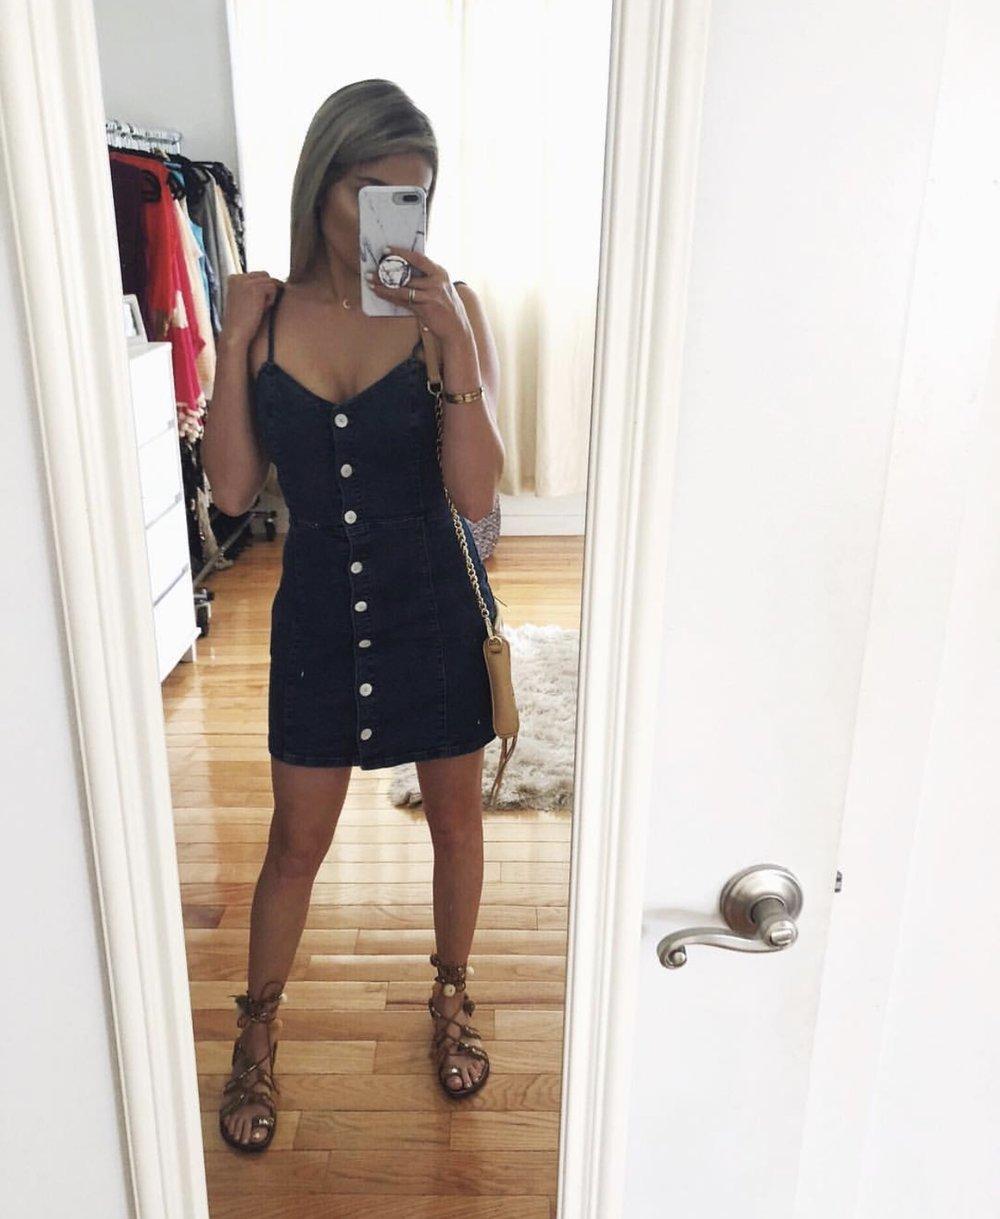 Recreate the Look: - Dress: ZaraCrescent Moon Necklace: DFTI BoutiqueCrossbody Bag: Rebecca MinkoffShoes: Sam Edelman